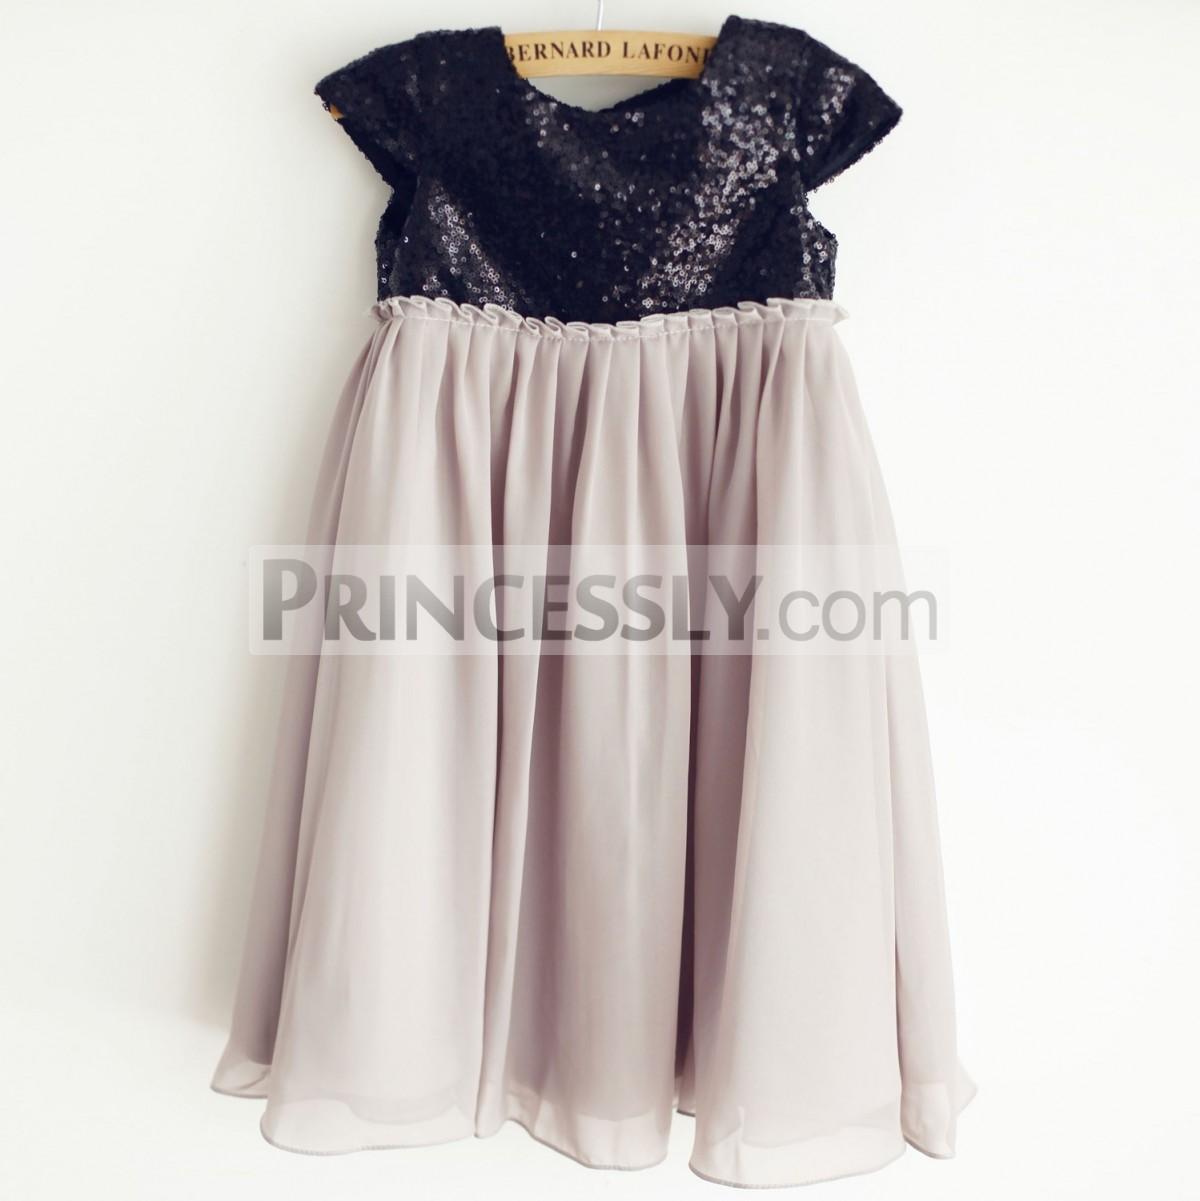 Princessly.com-K1003959-Black Sequin Gray Chiffon Cap Sleeves Wedding Flower Girl Dress-31